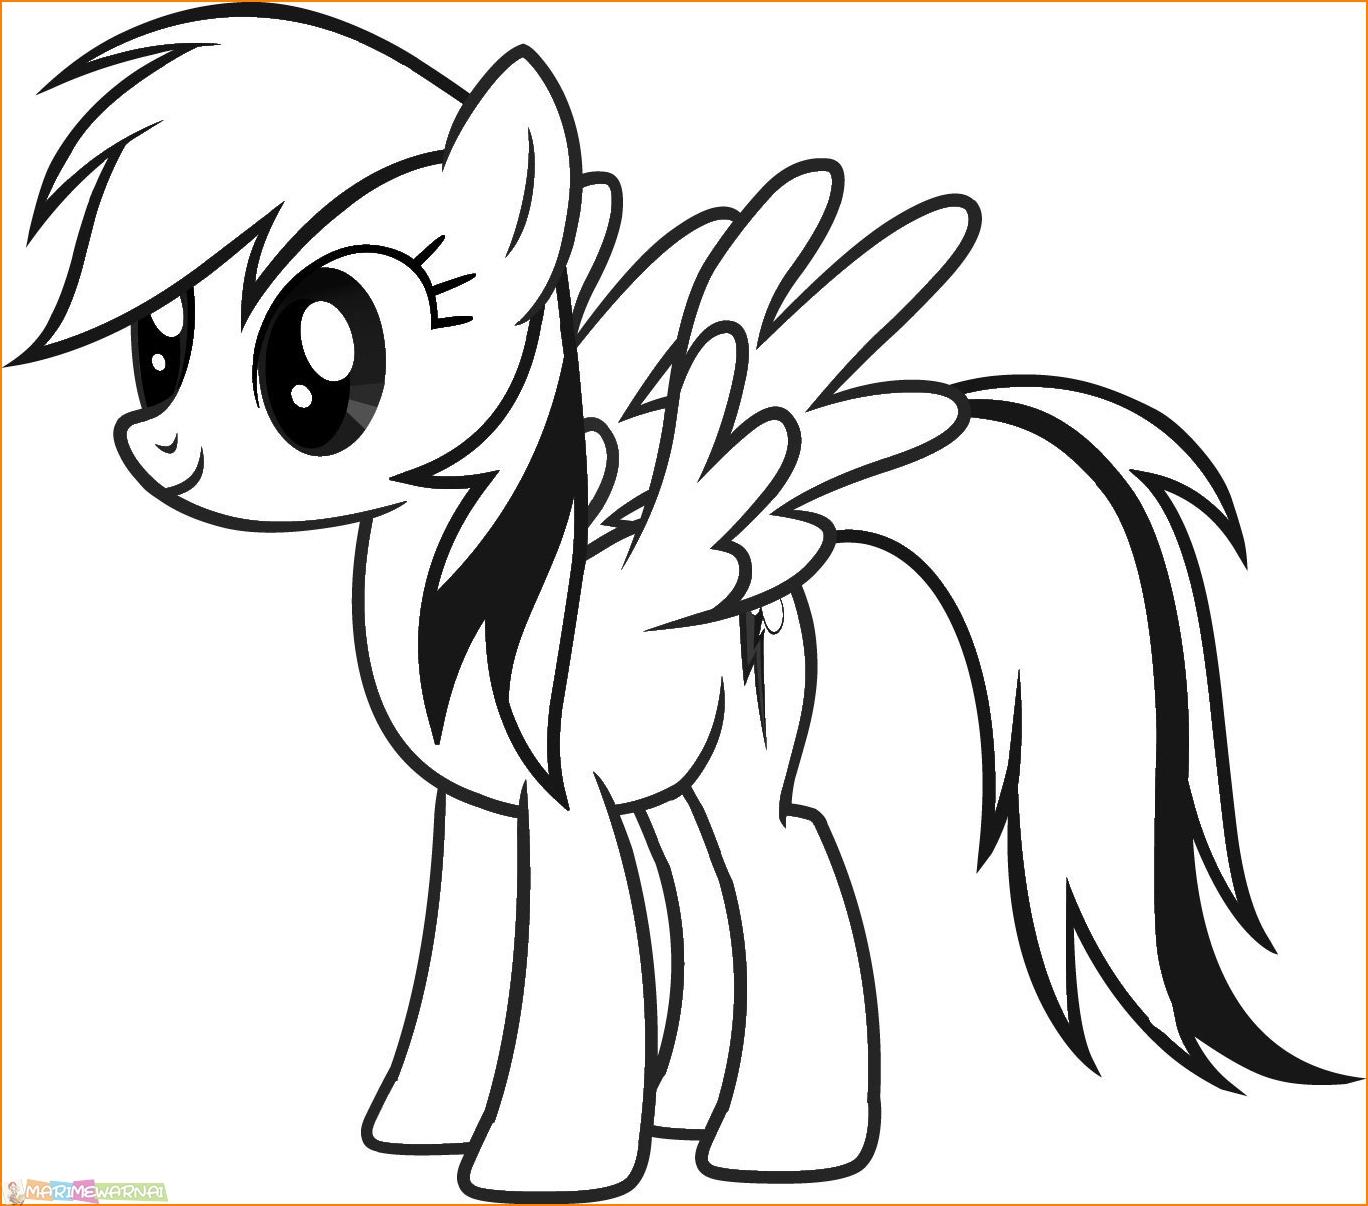 29 Gambar Mewarnai My Little Pony Anak 2020 Marimewarnai Com